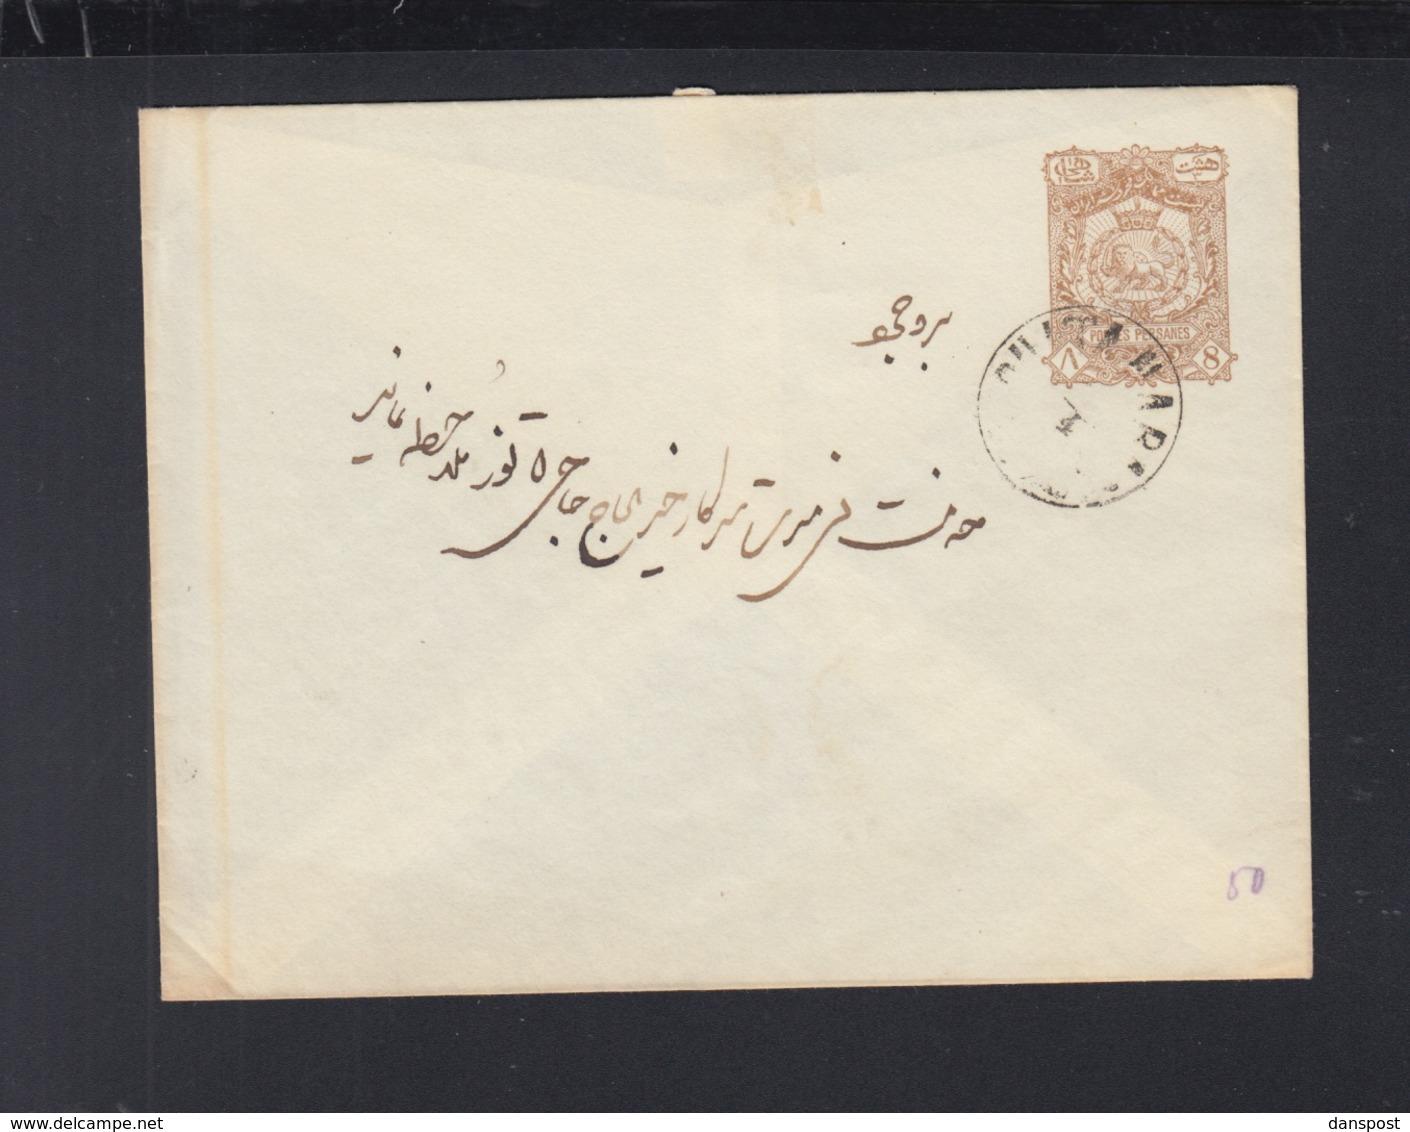 Persia Iran Stationery Cover Used (3) - Iran